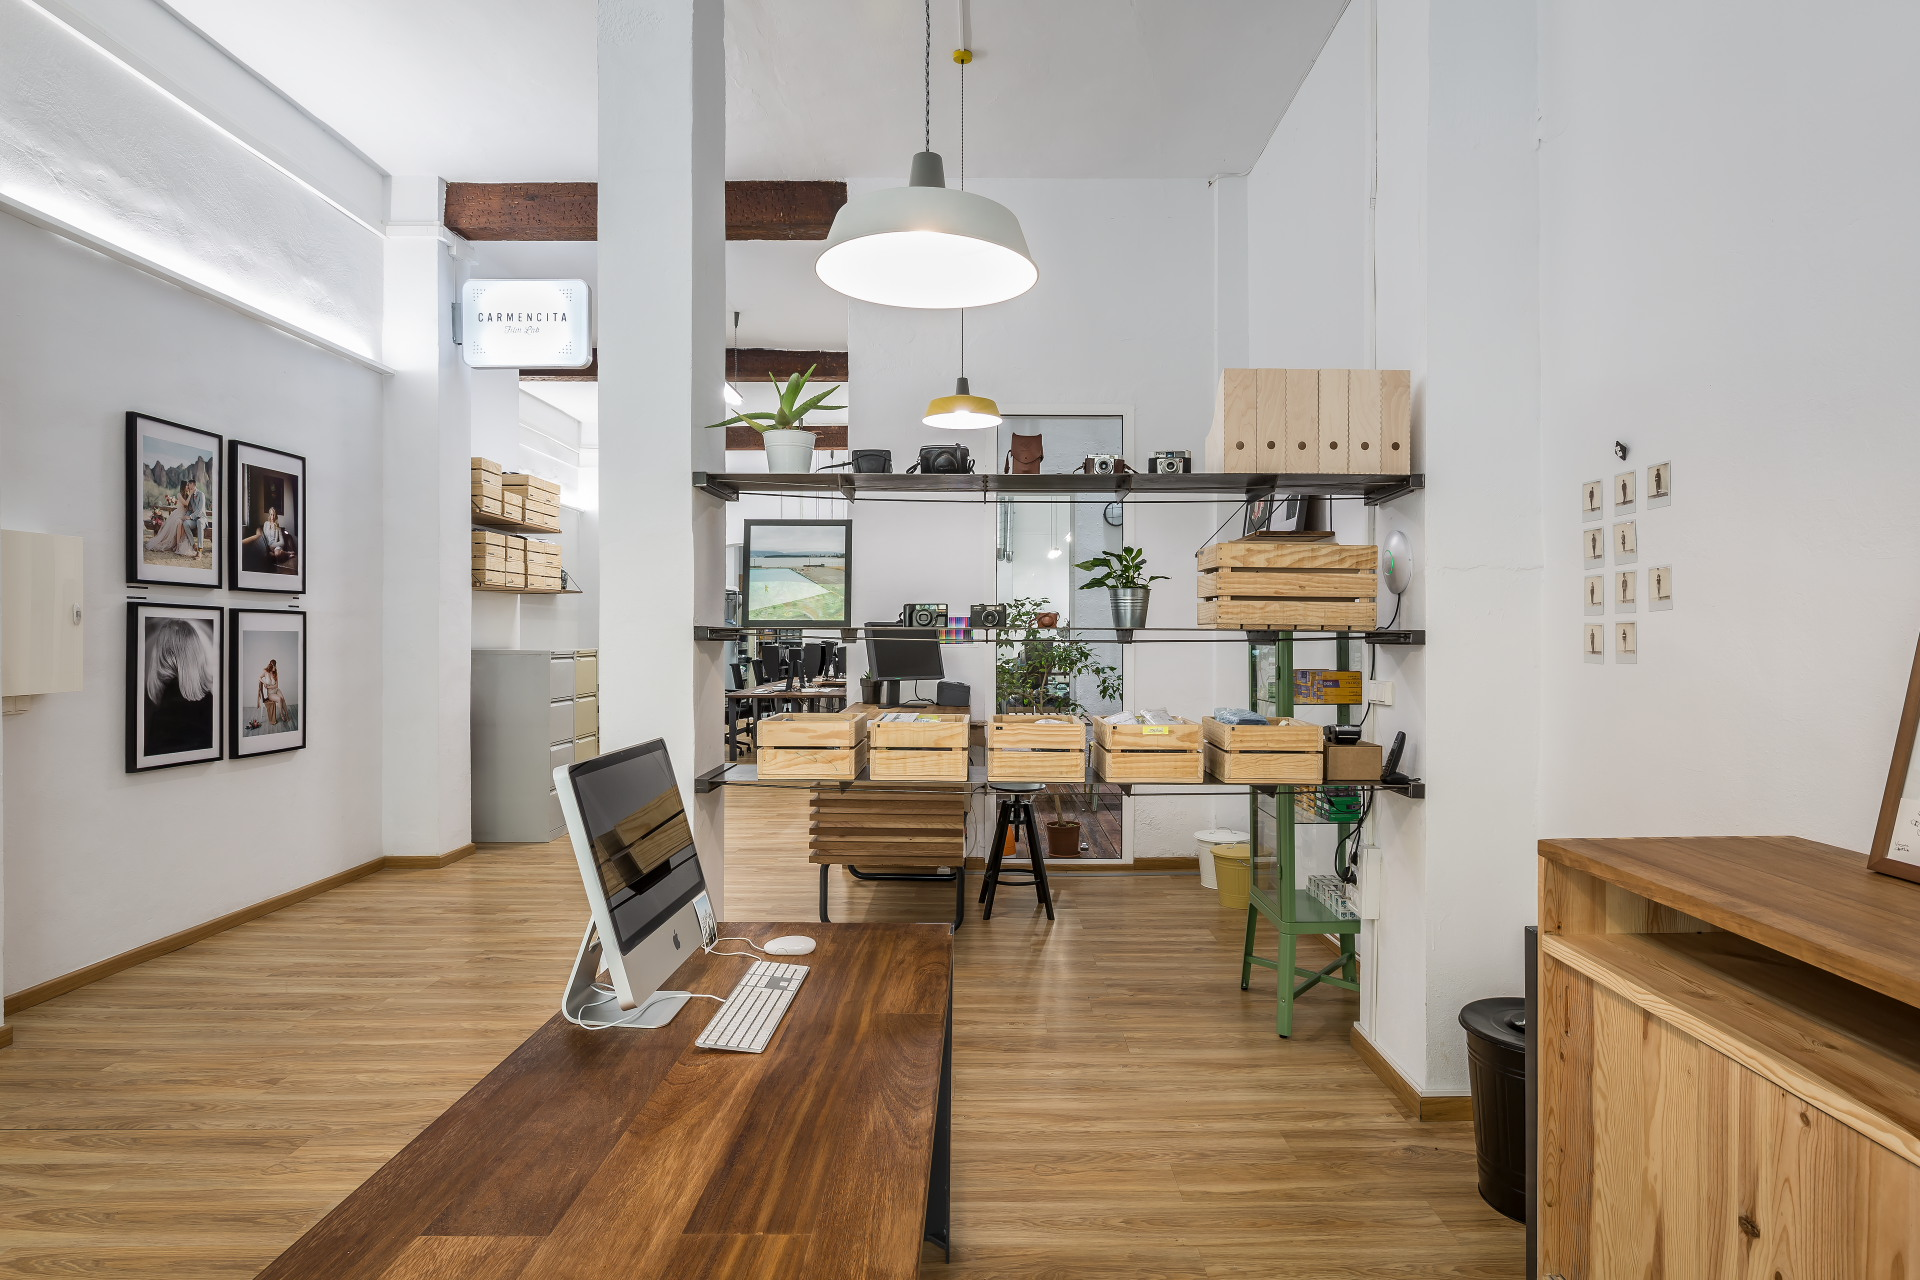 fotografia-arquitectura-interiorismo-valencia-german-cabo-boubau-carmencita-carmencitafilmlab (6)